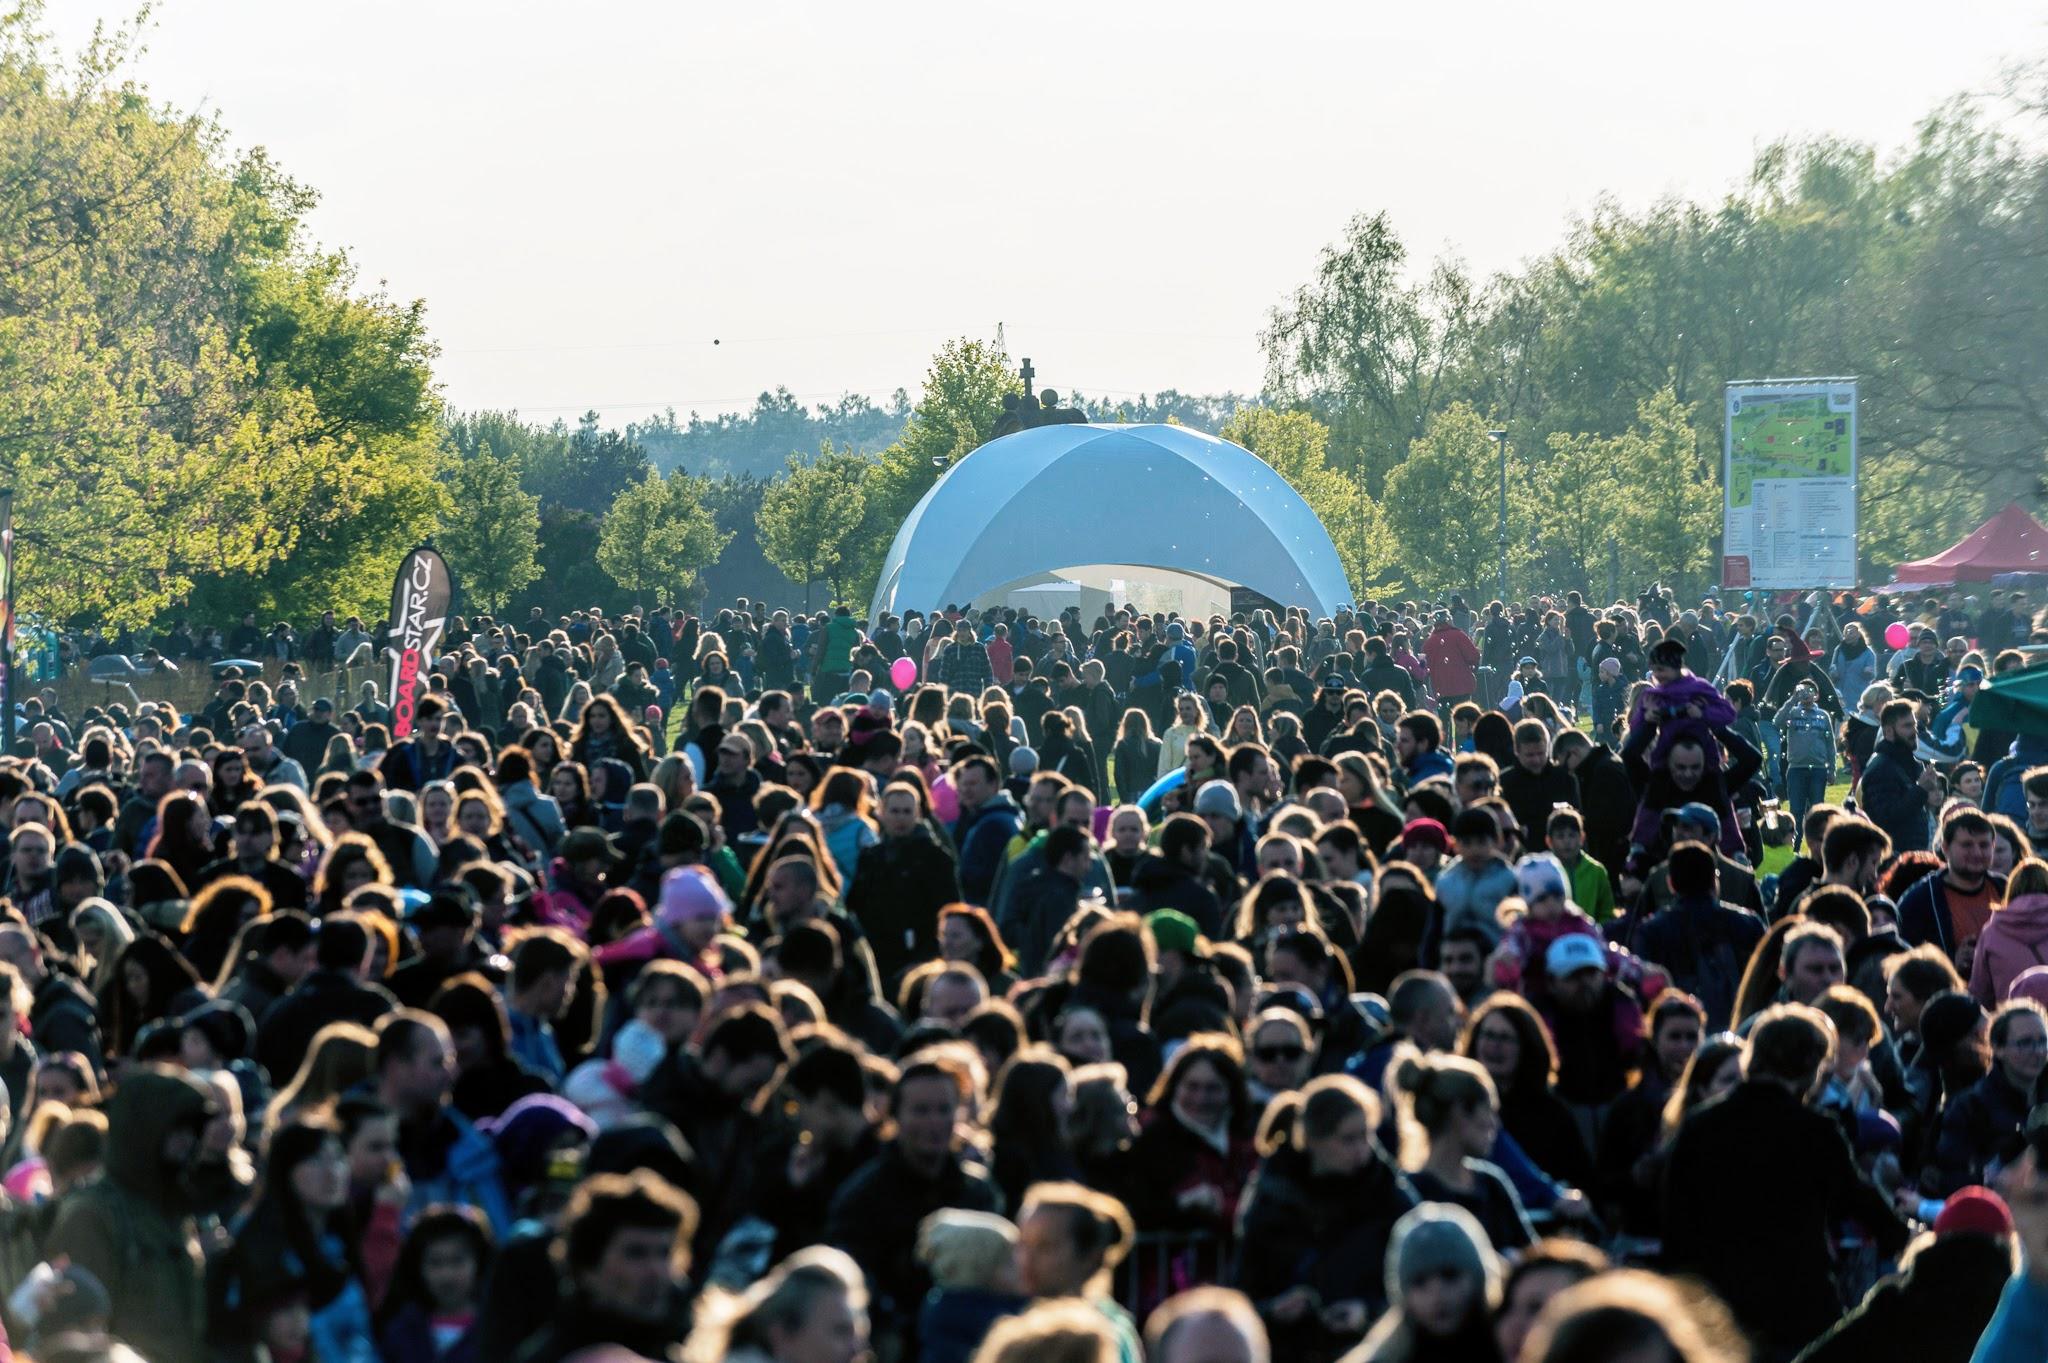 festivaly -